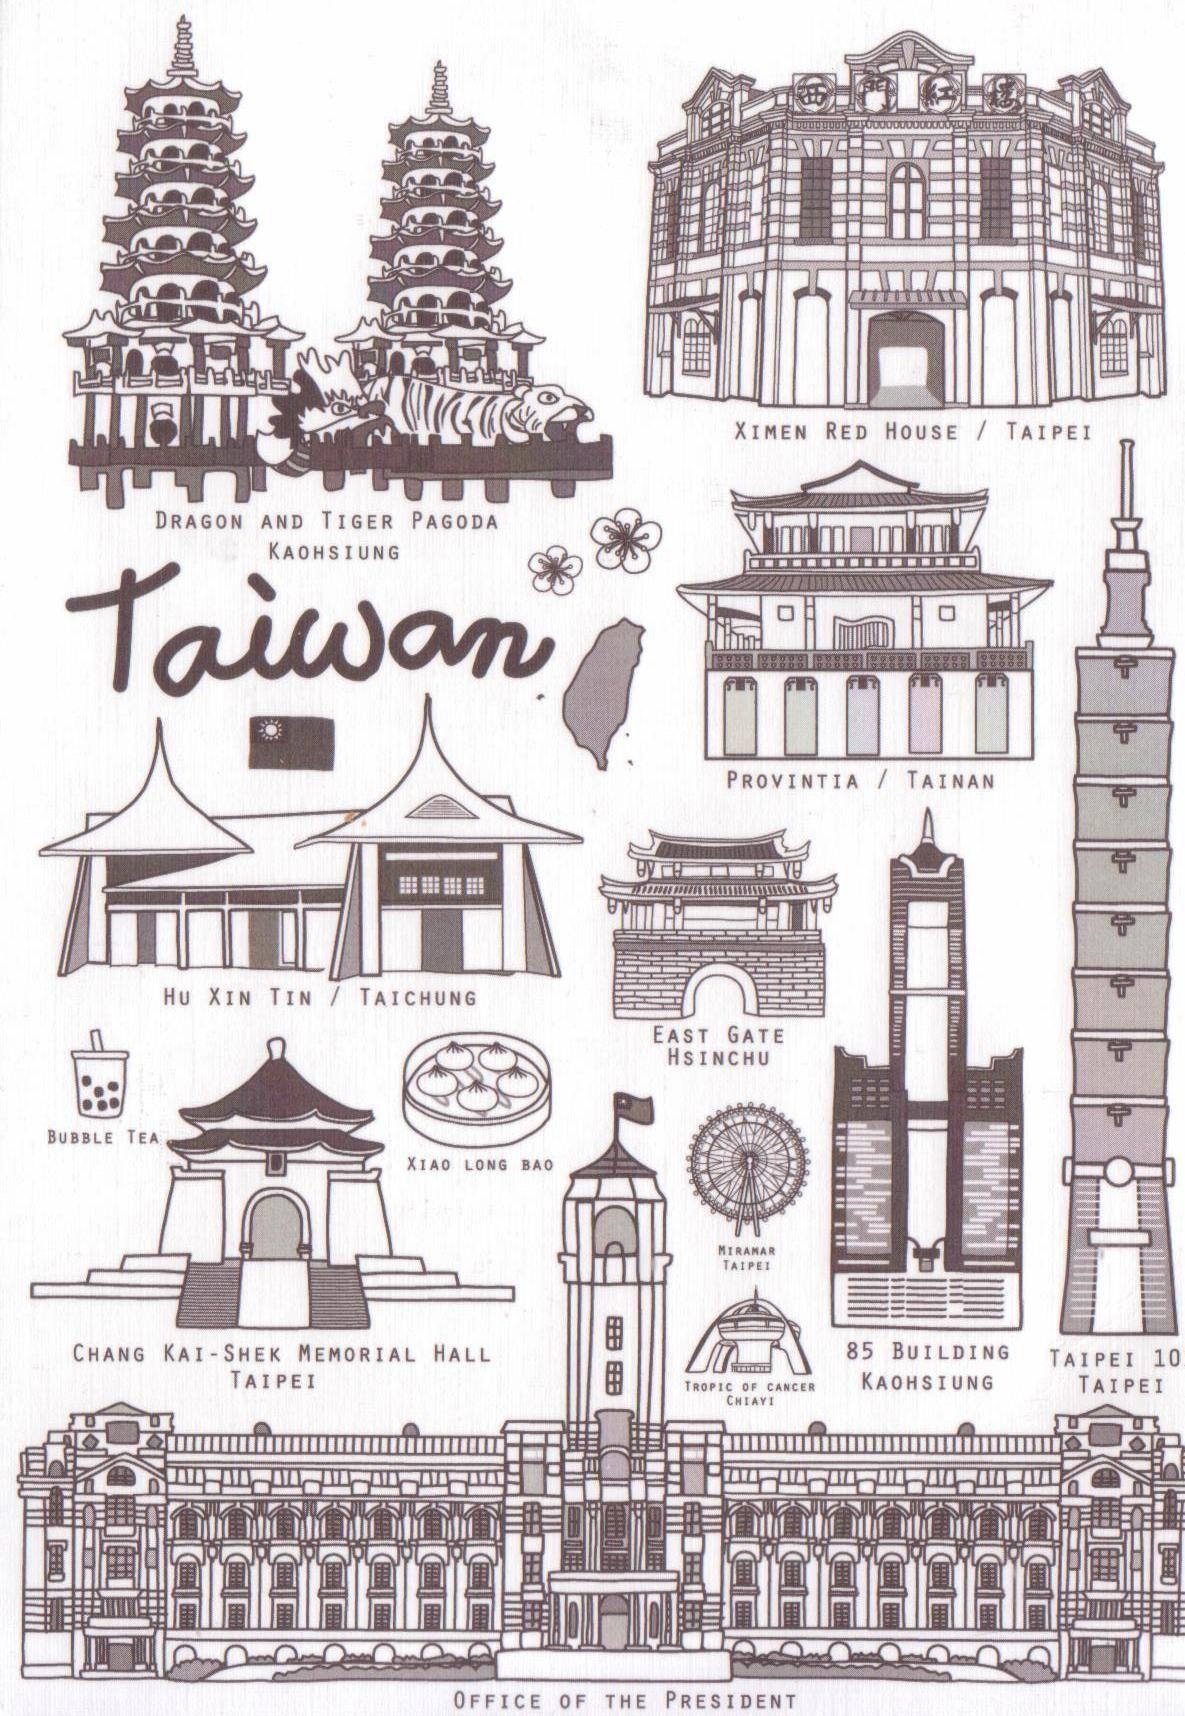 taiwan travel guide pdf download